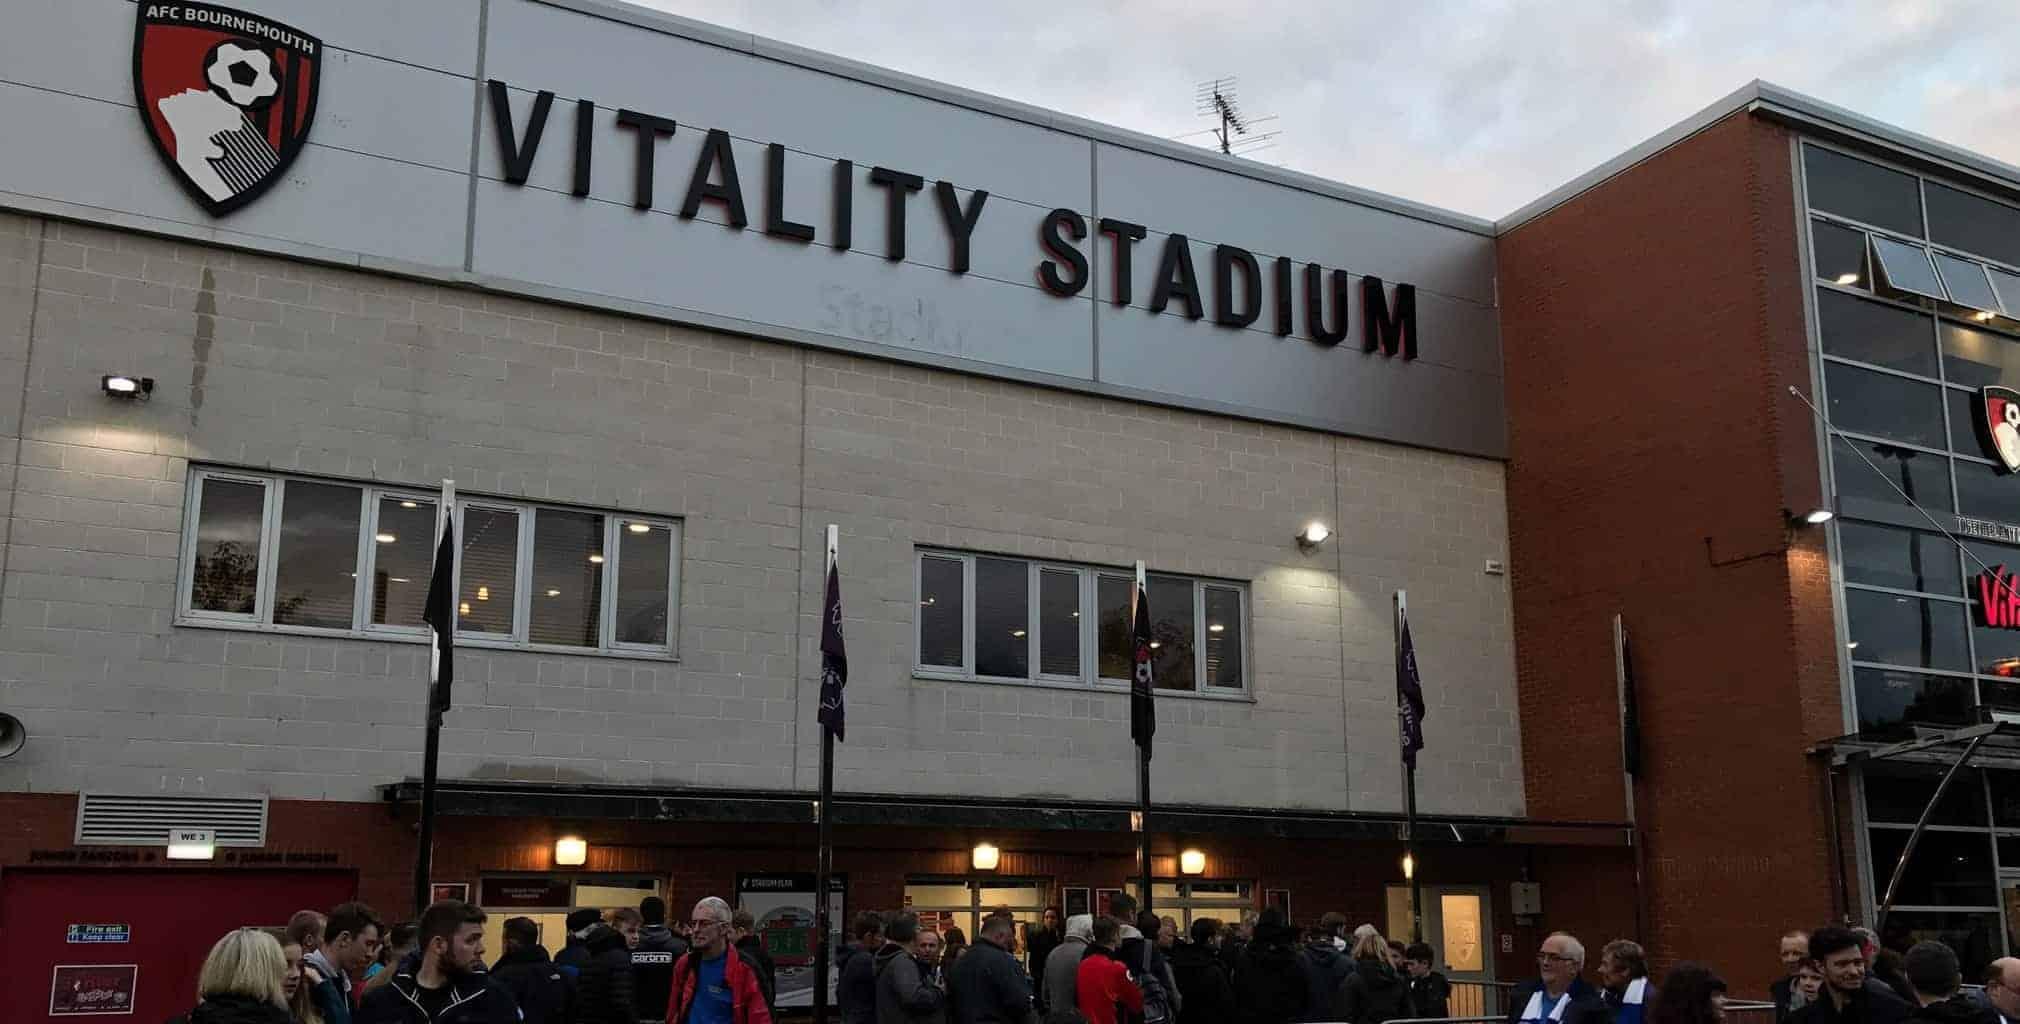 Vitality Stadium exterior AFC Bournemouth